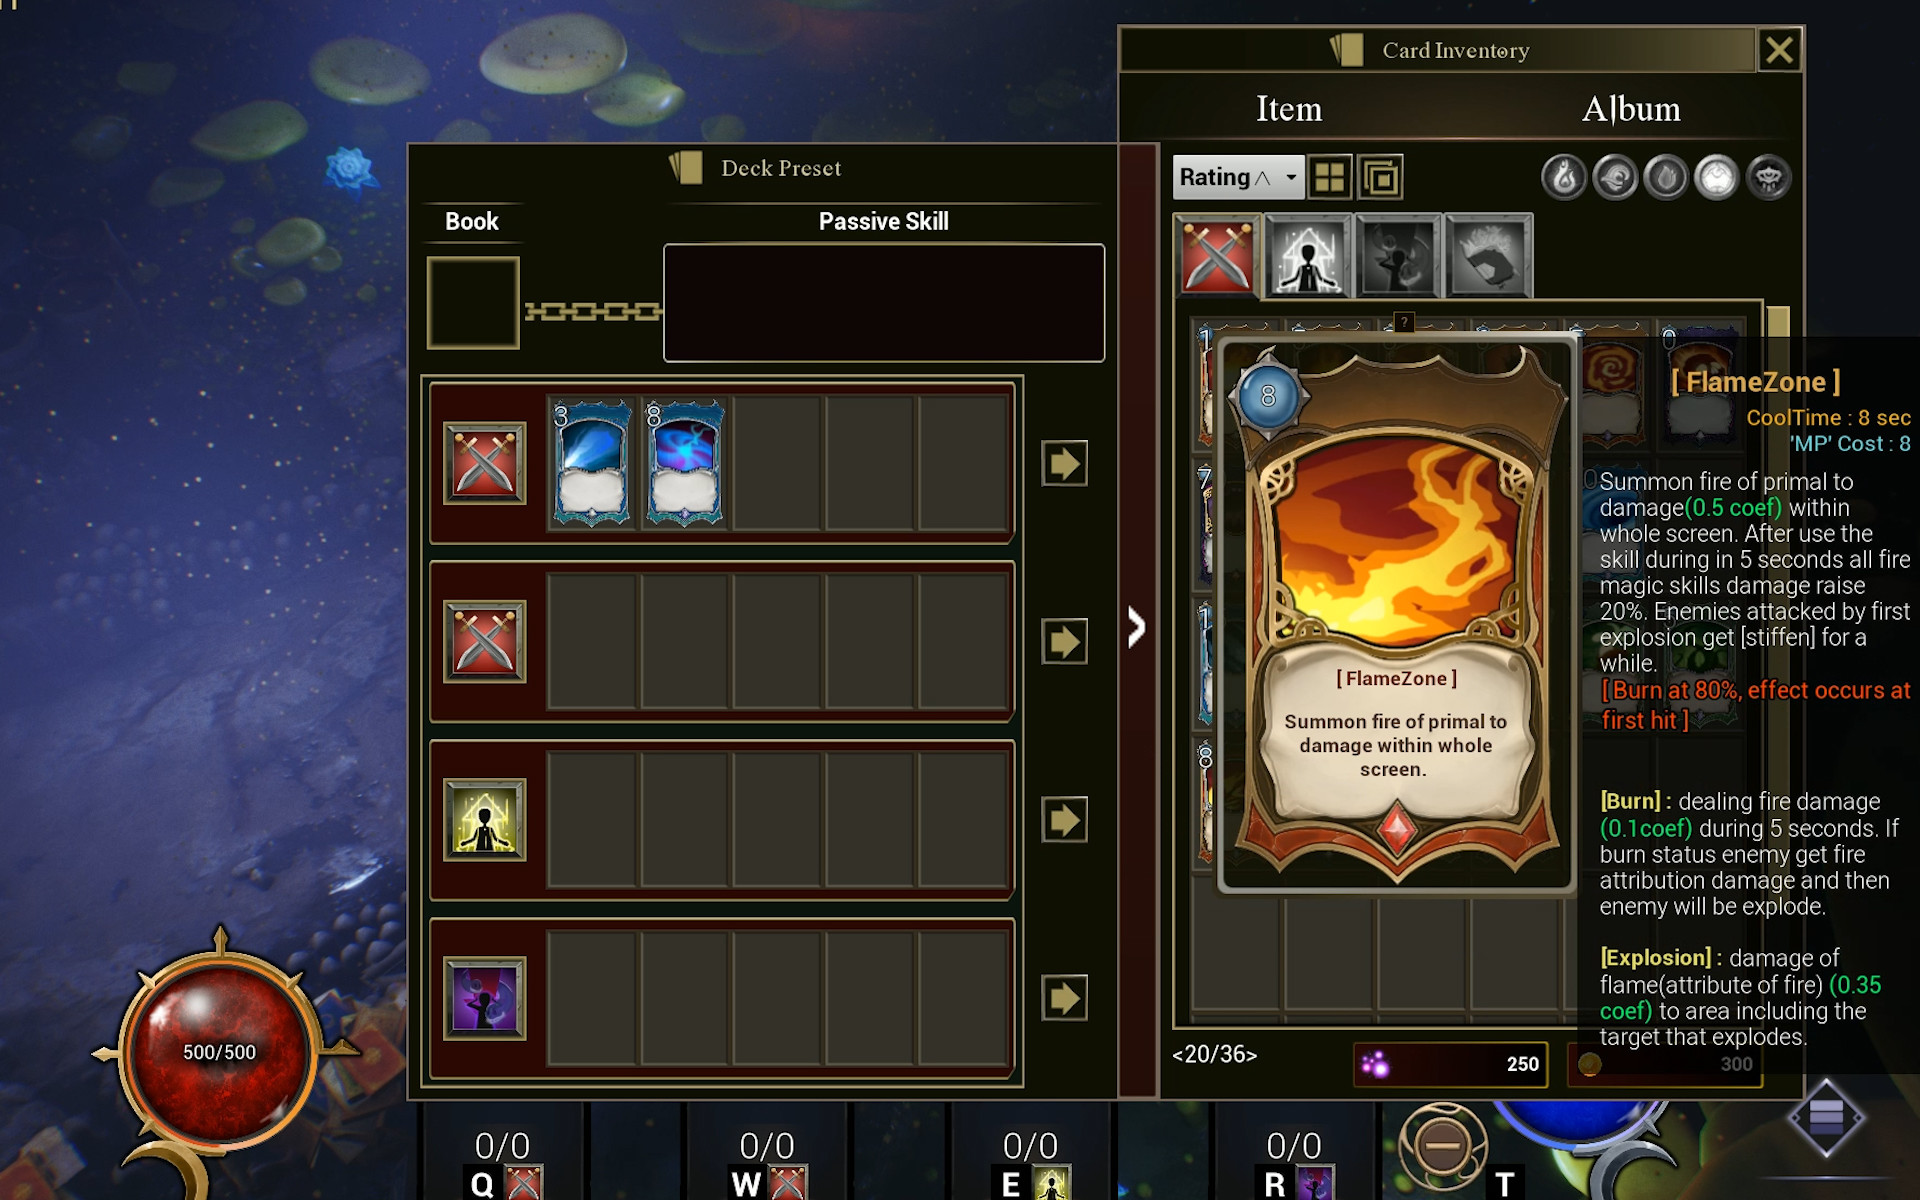 Tower of Arcana screenshot